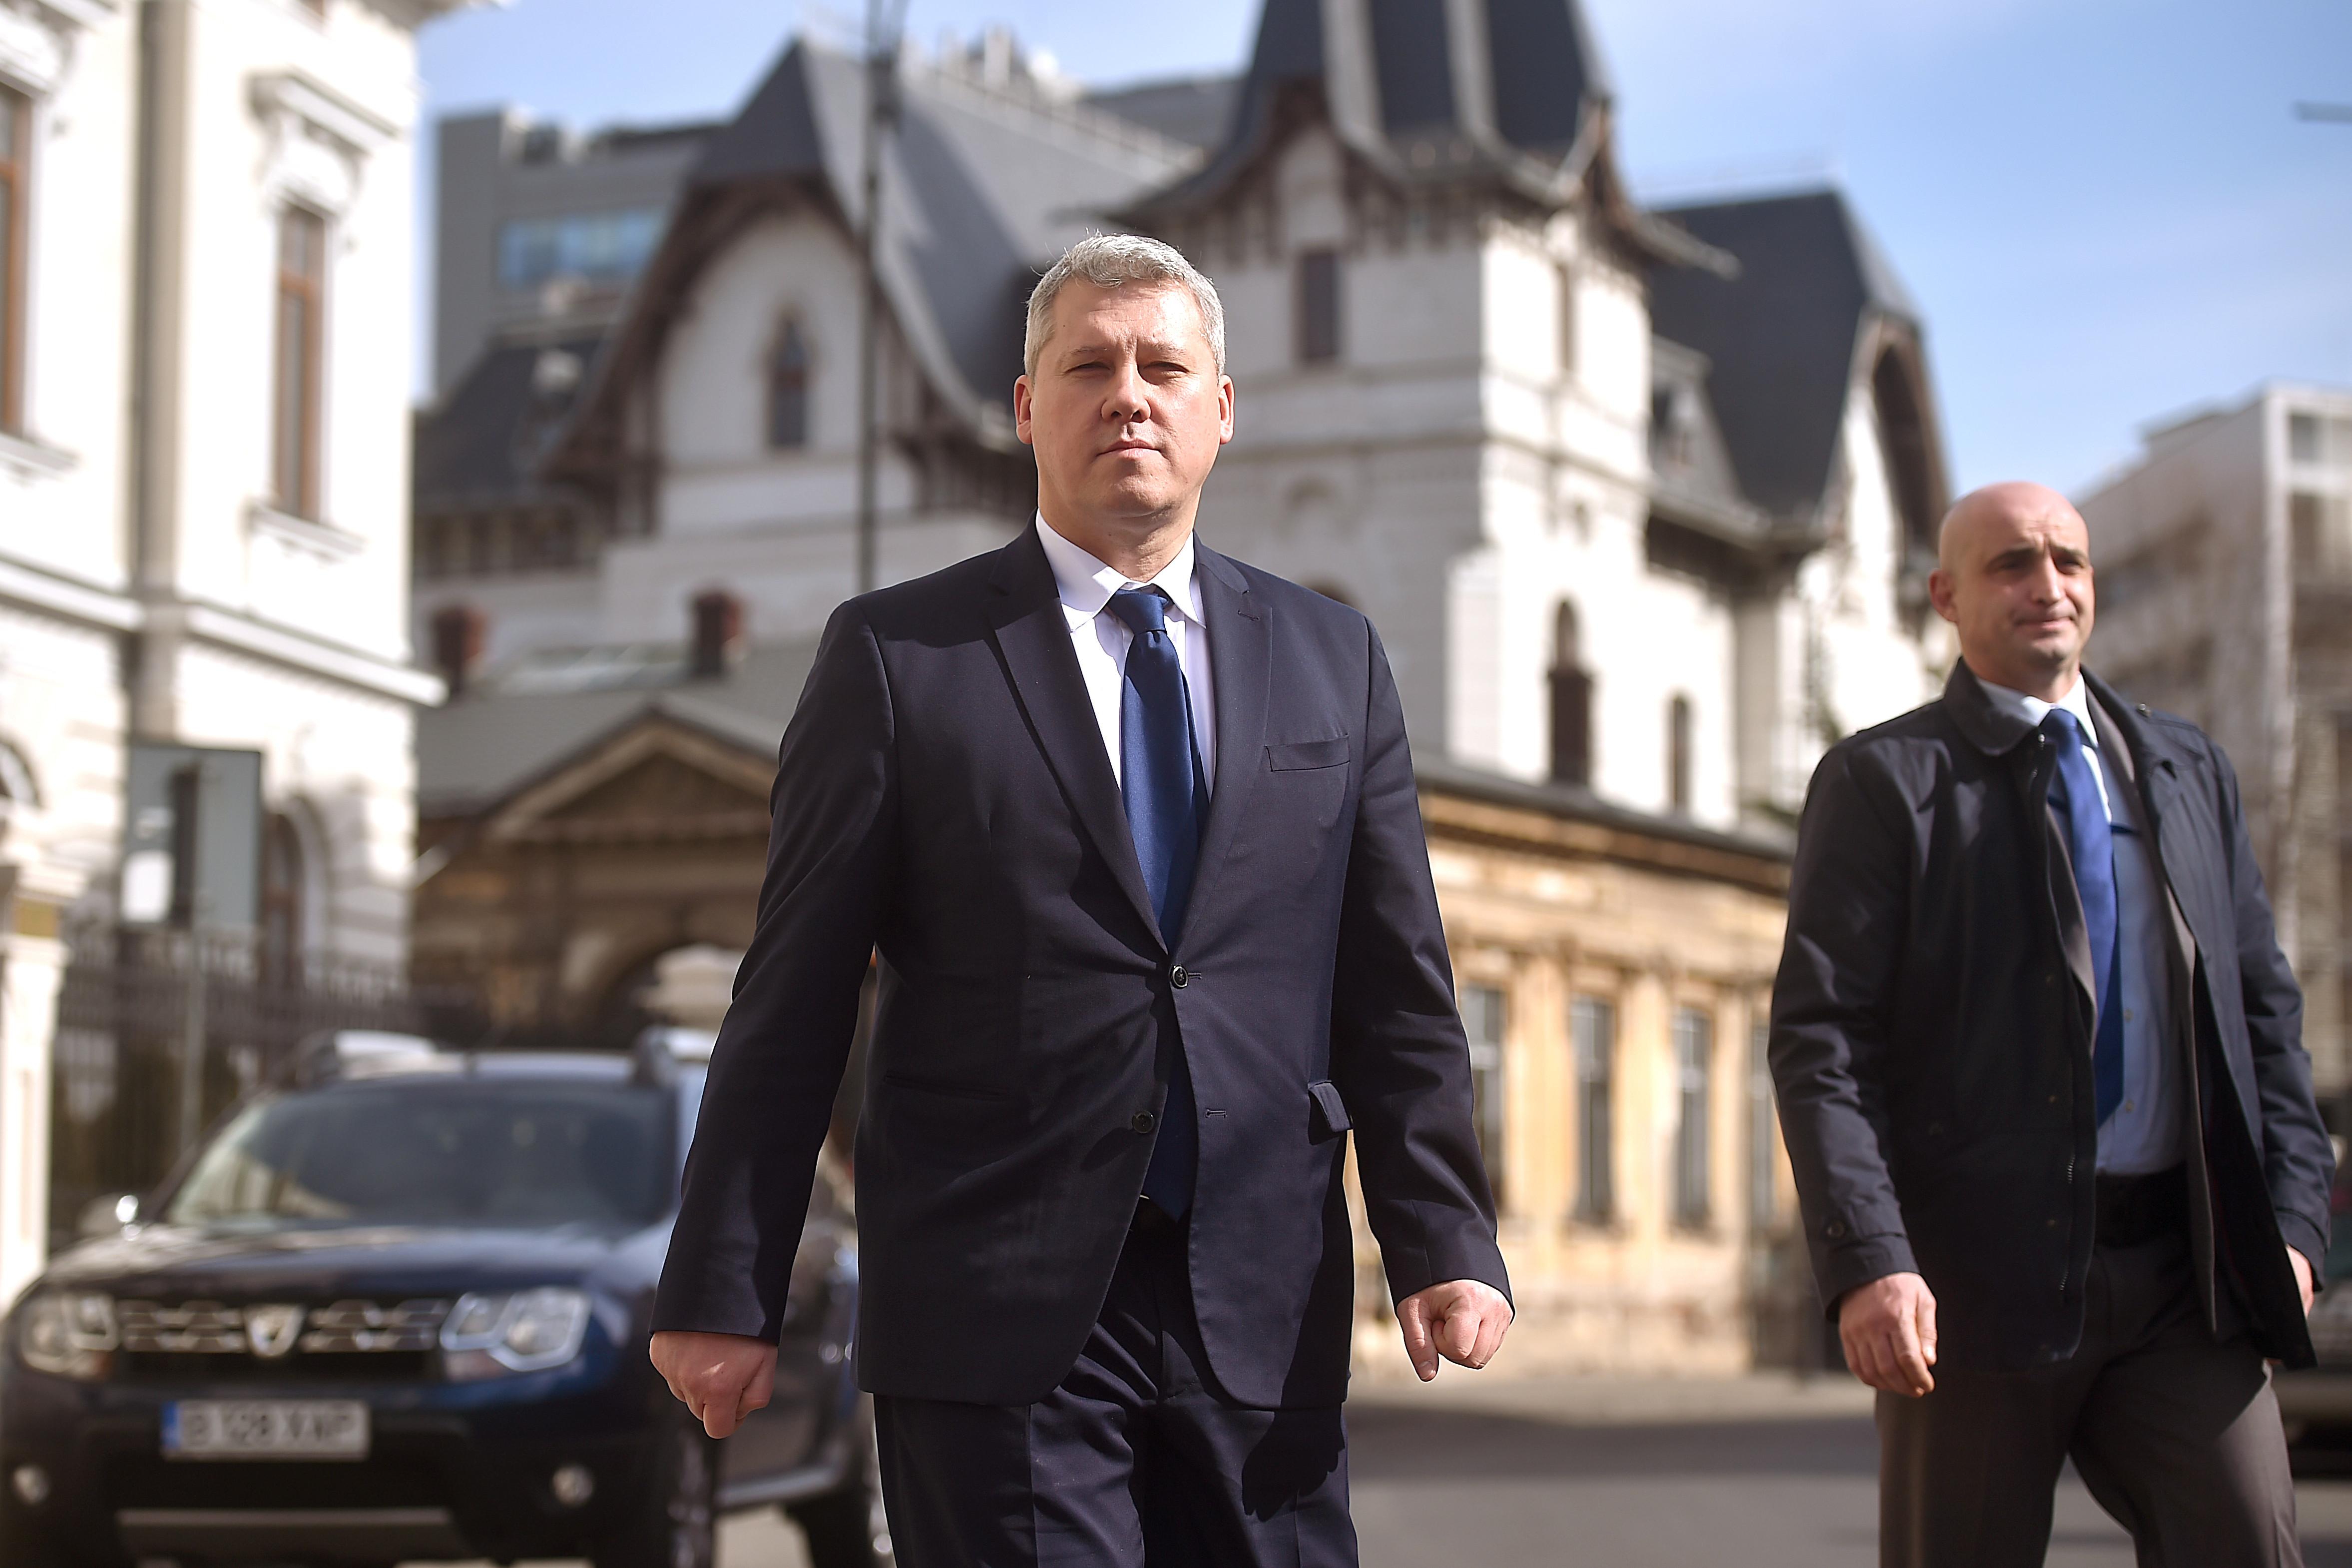 Ministrul Predoiu a discutat cu ambasadorii statelor UE despre justiție și Parchetul European